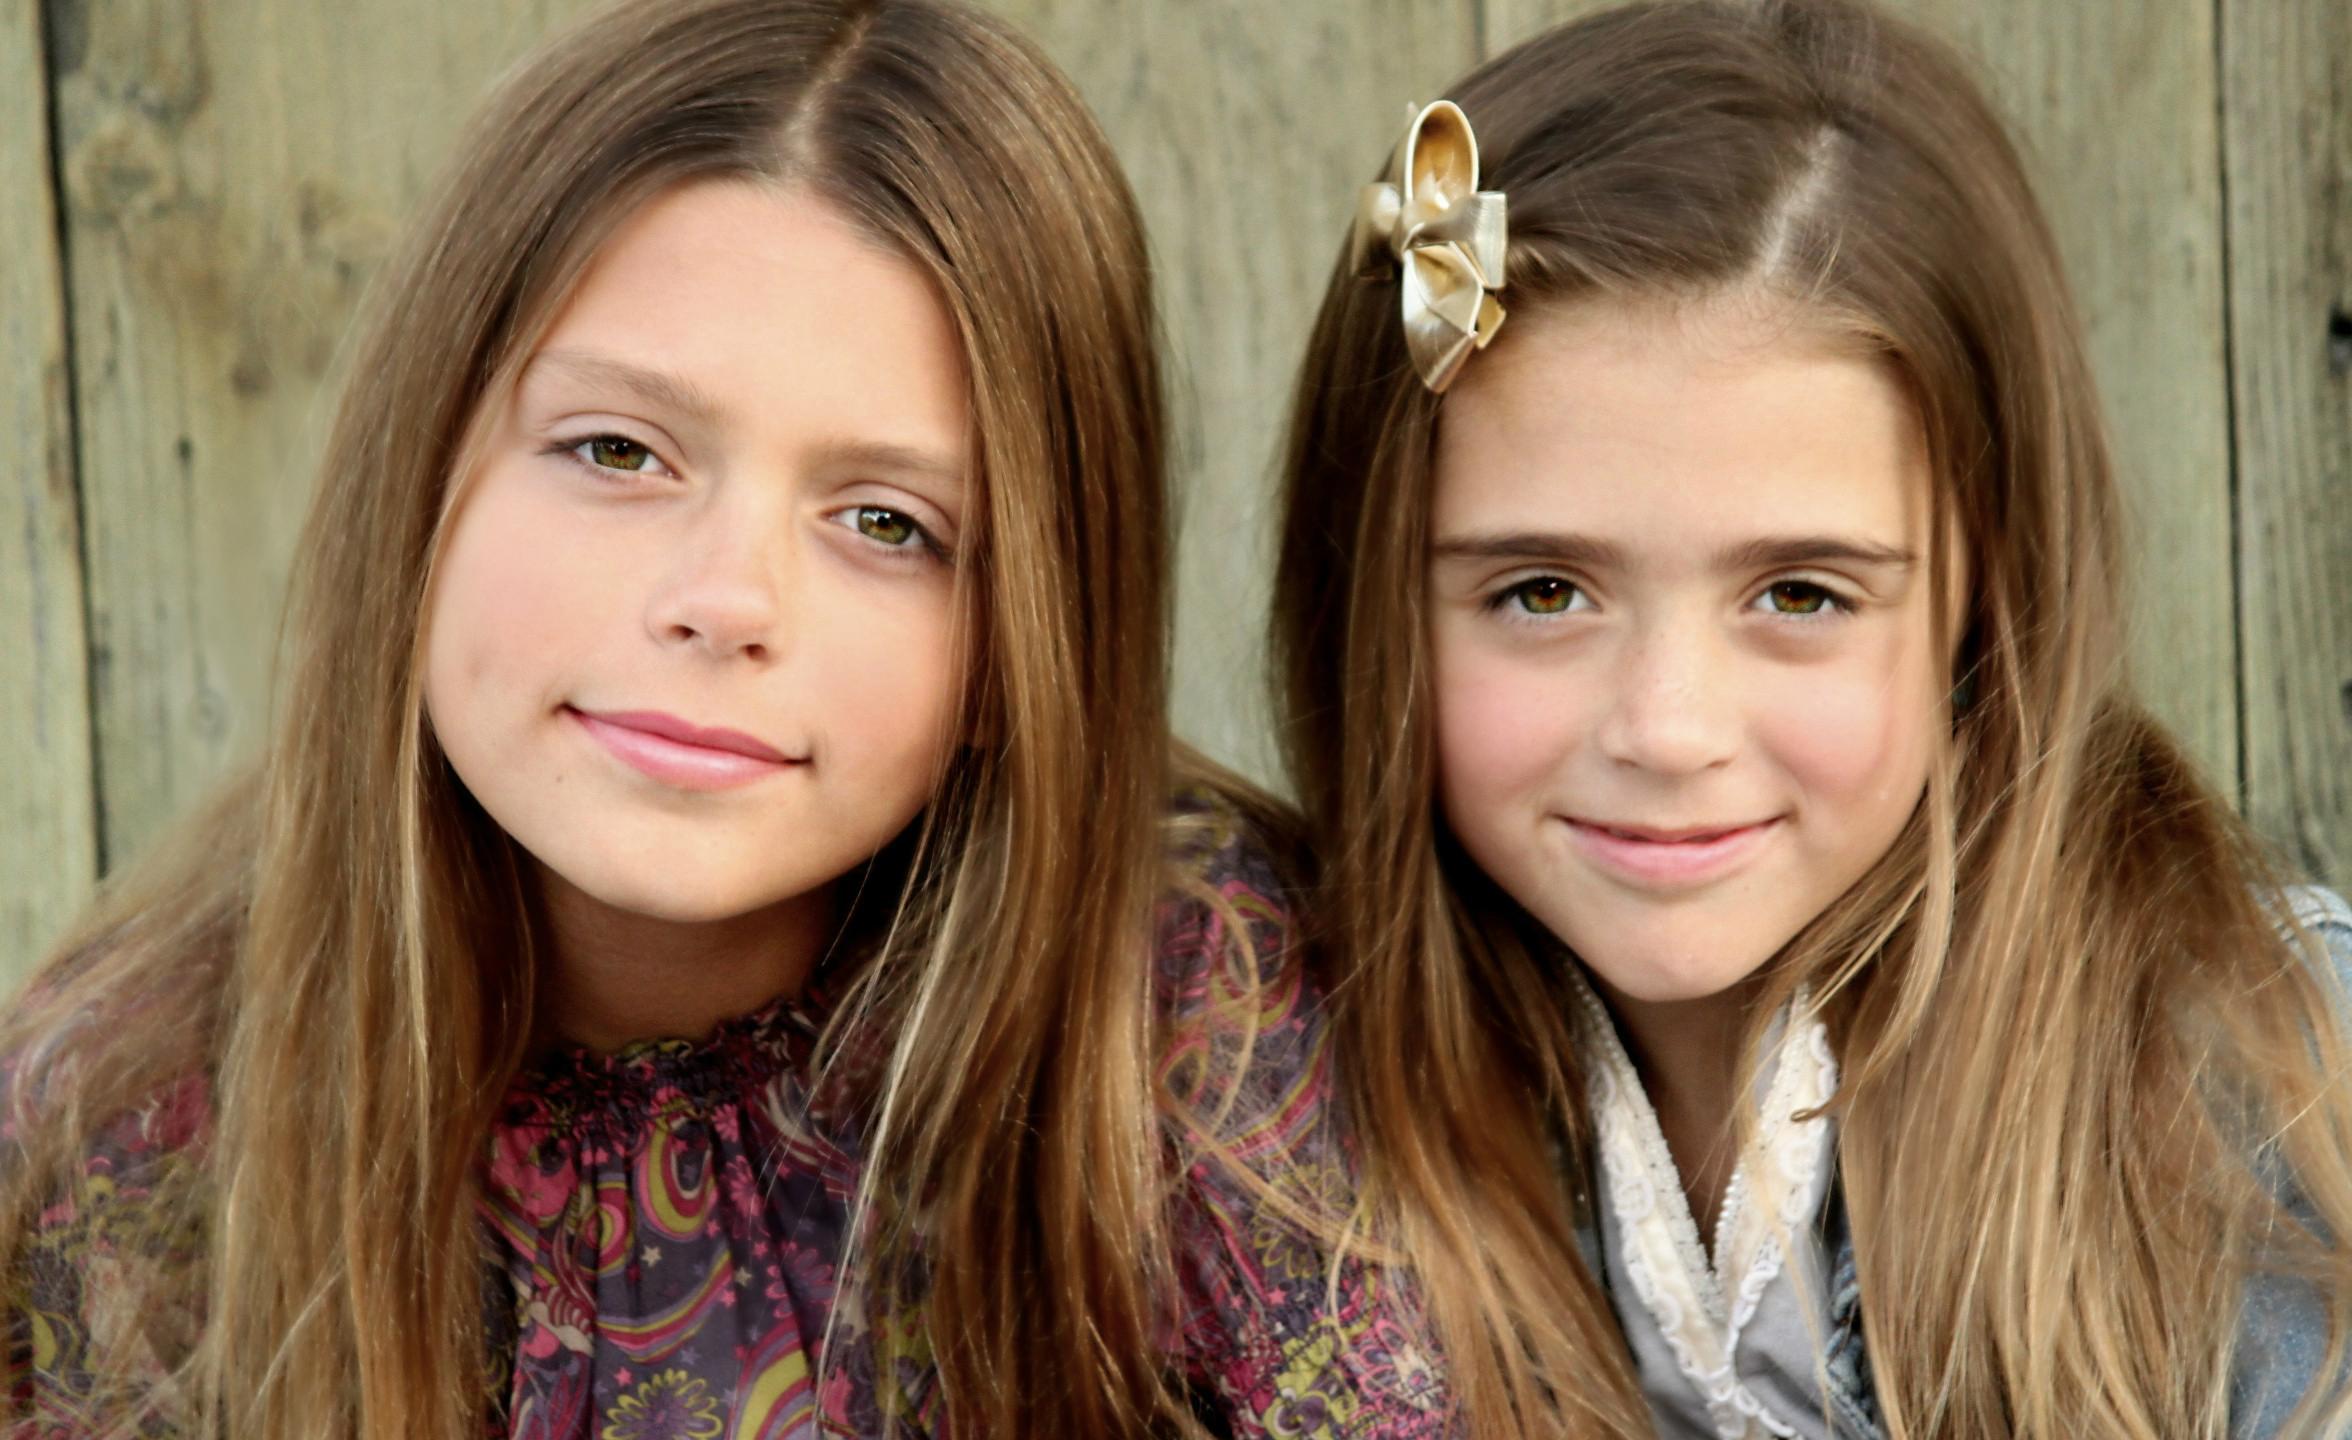 Brinley and Danica